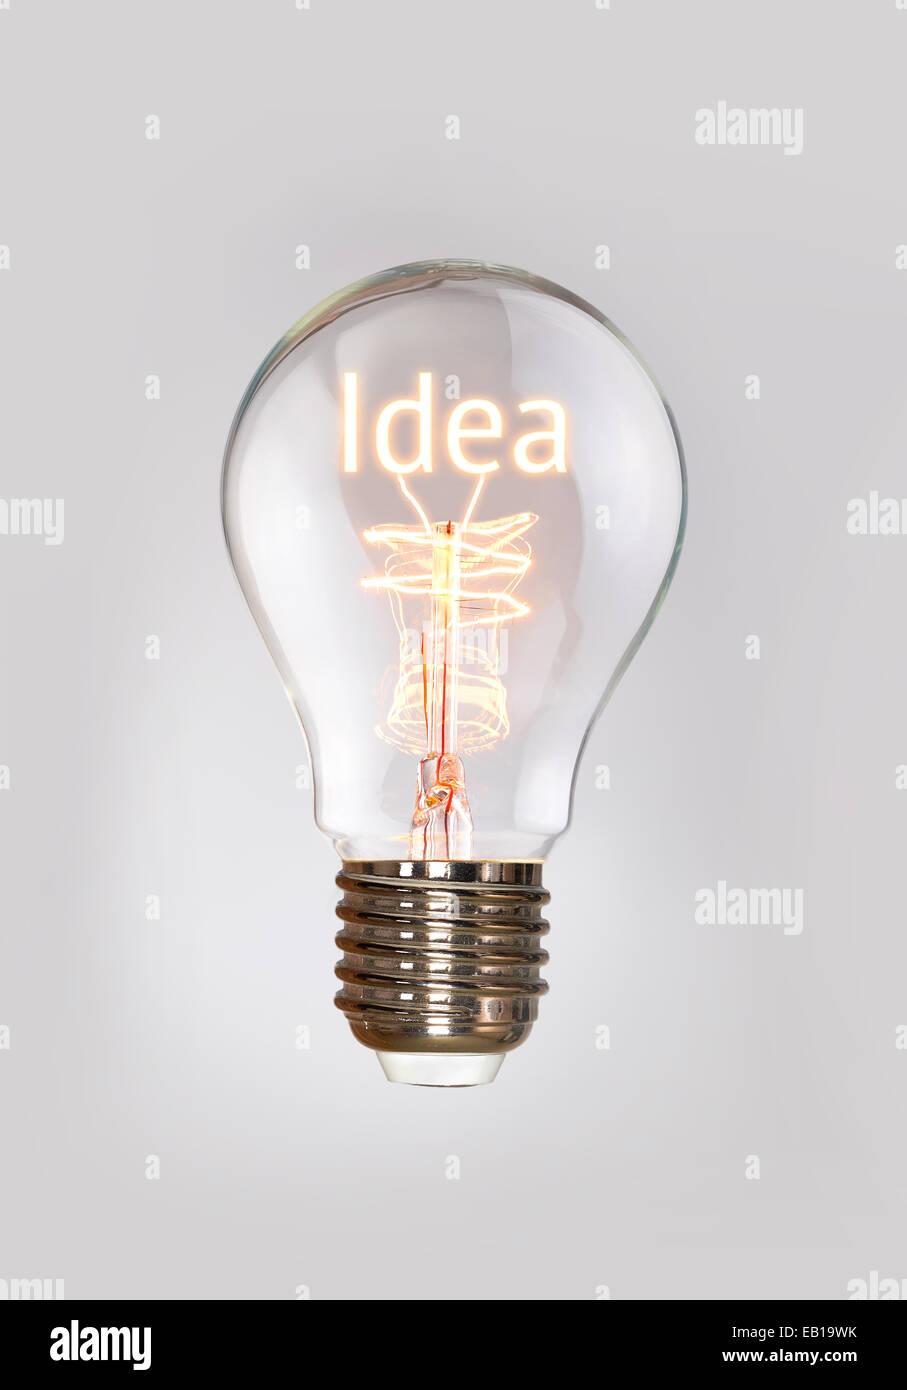 Ideas Stockfotos & Ideas Bilder - Alamy